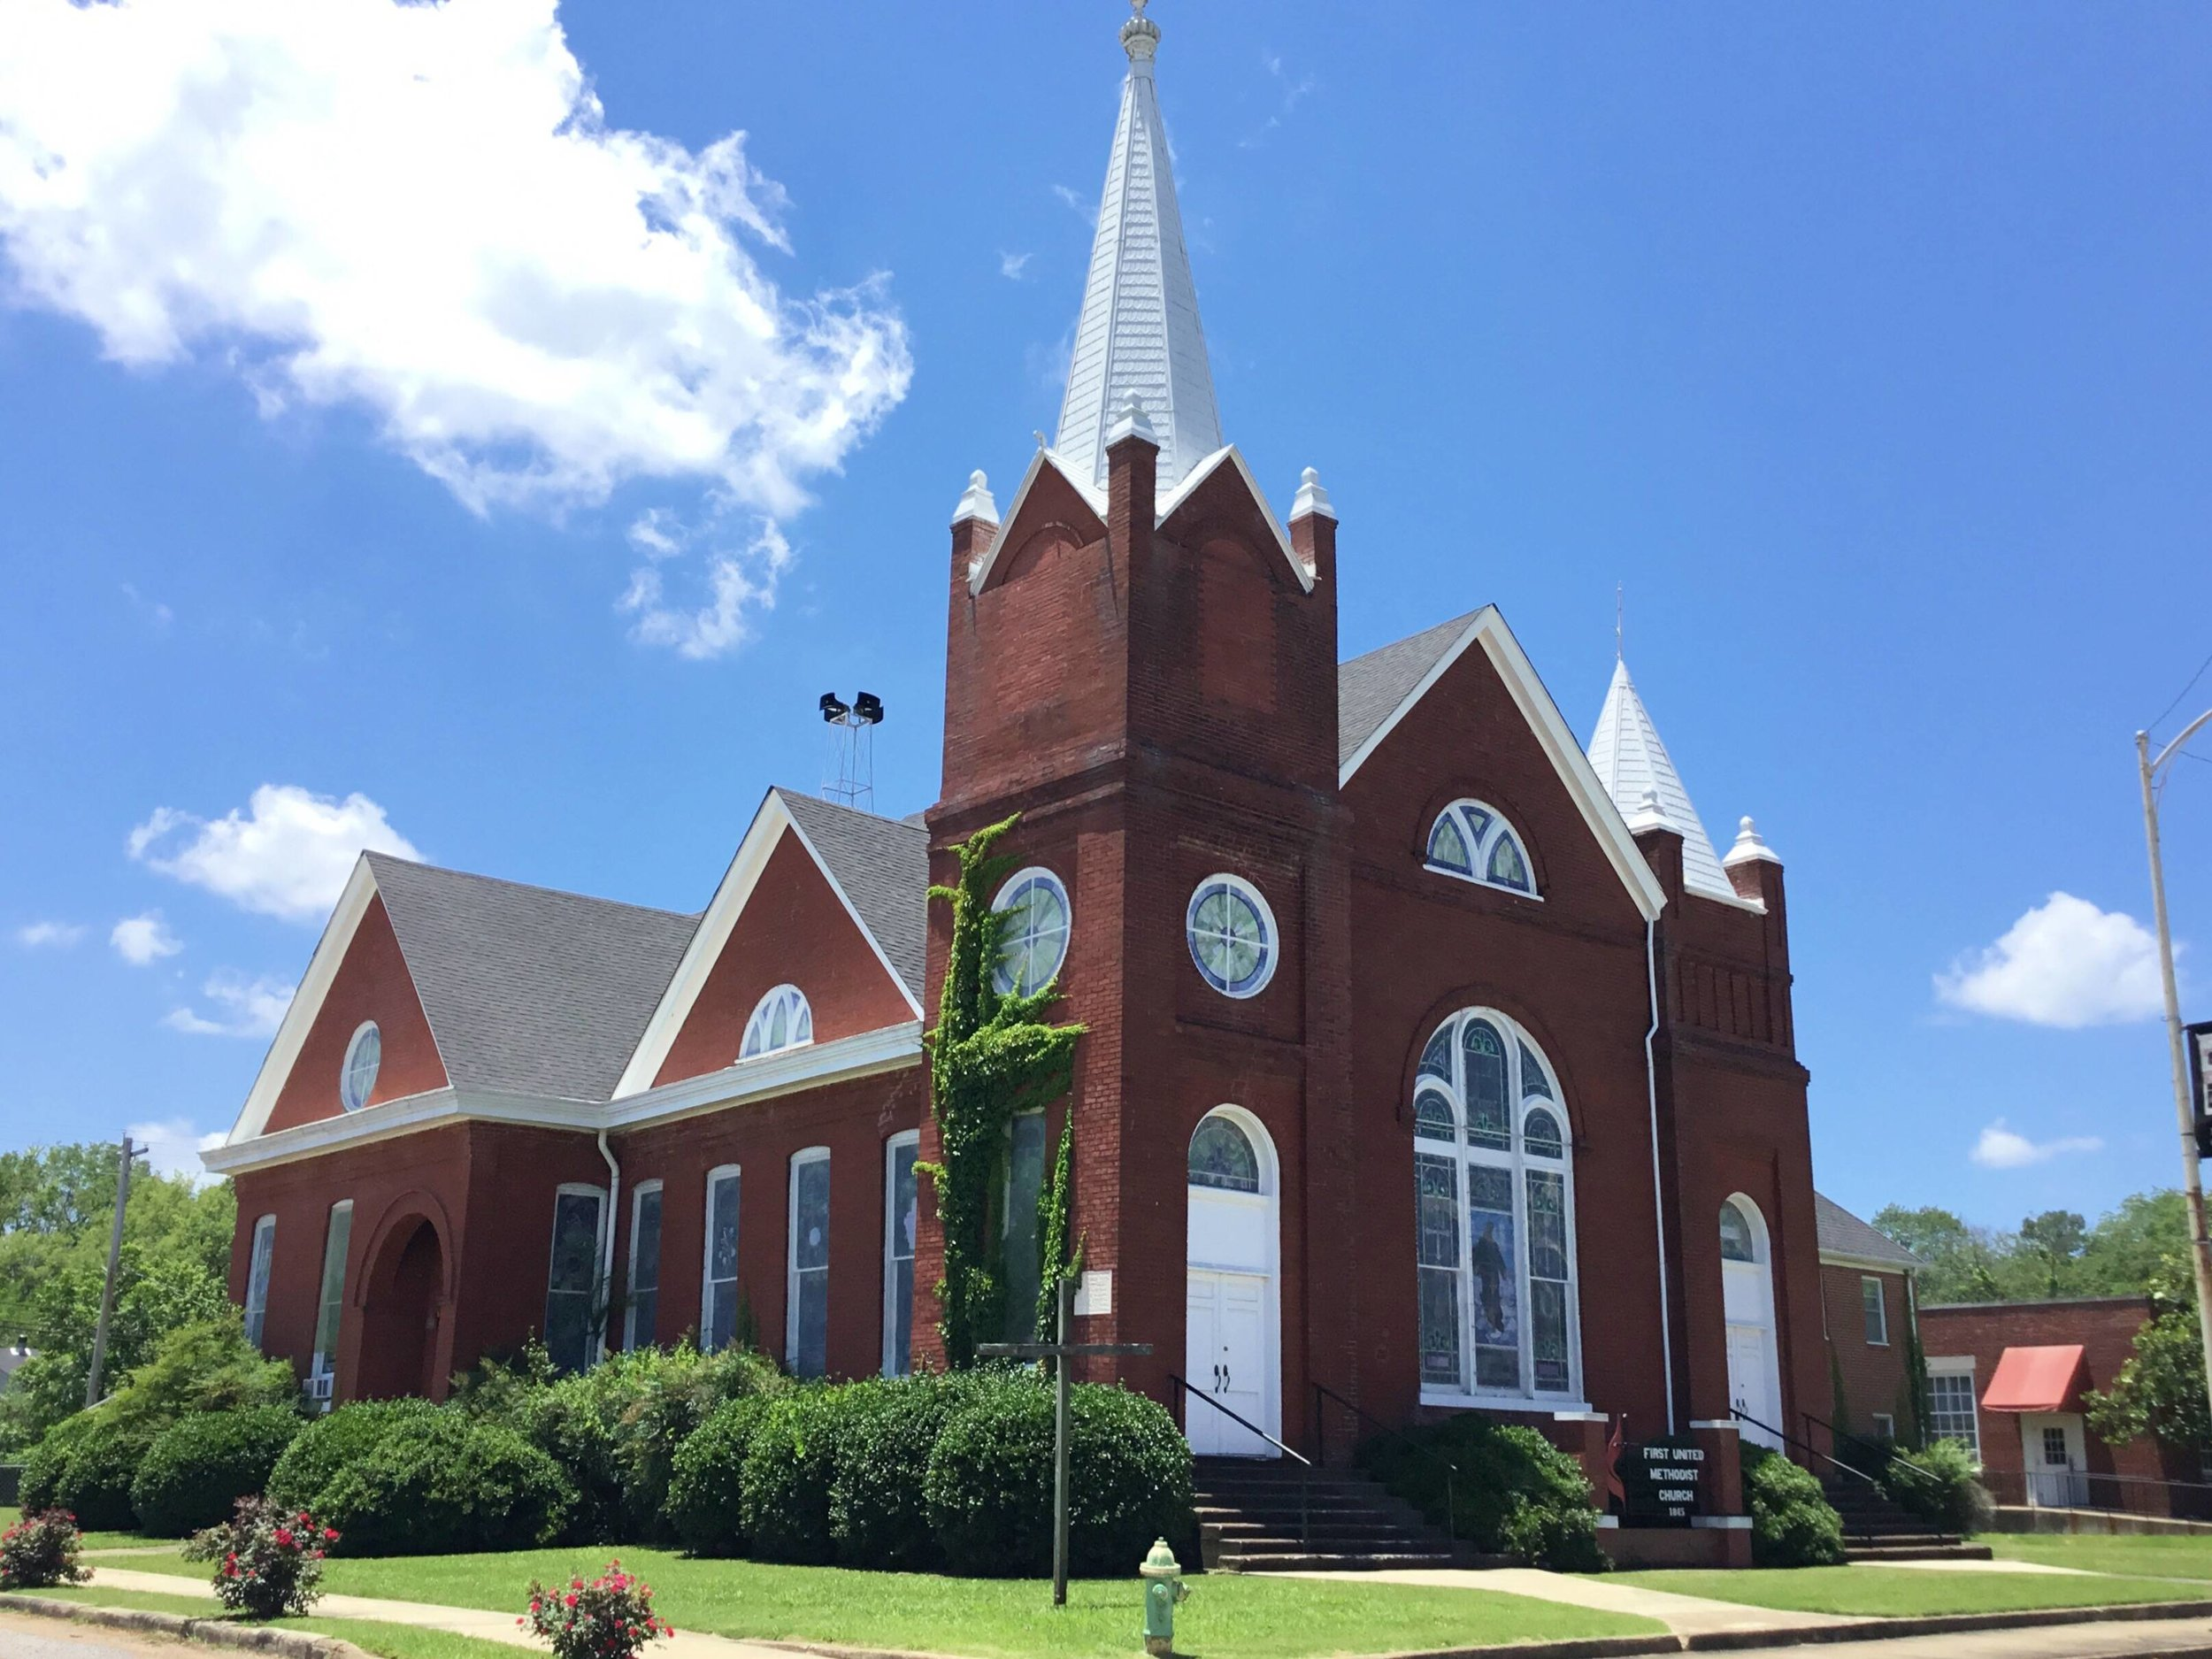 First United Methodist Church, Okolona, Miss., 1907.1